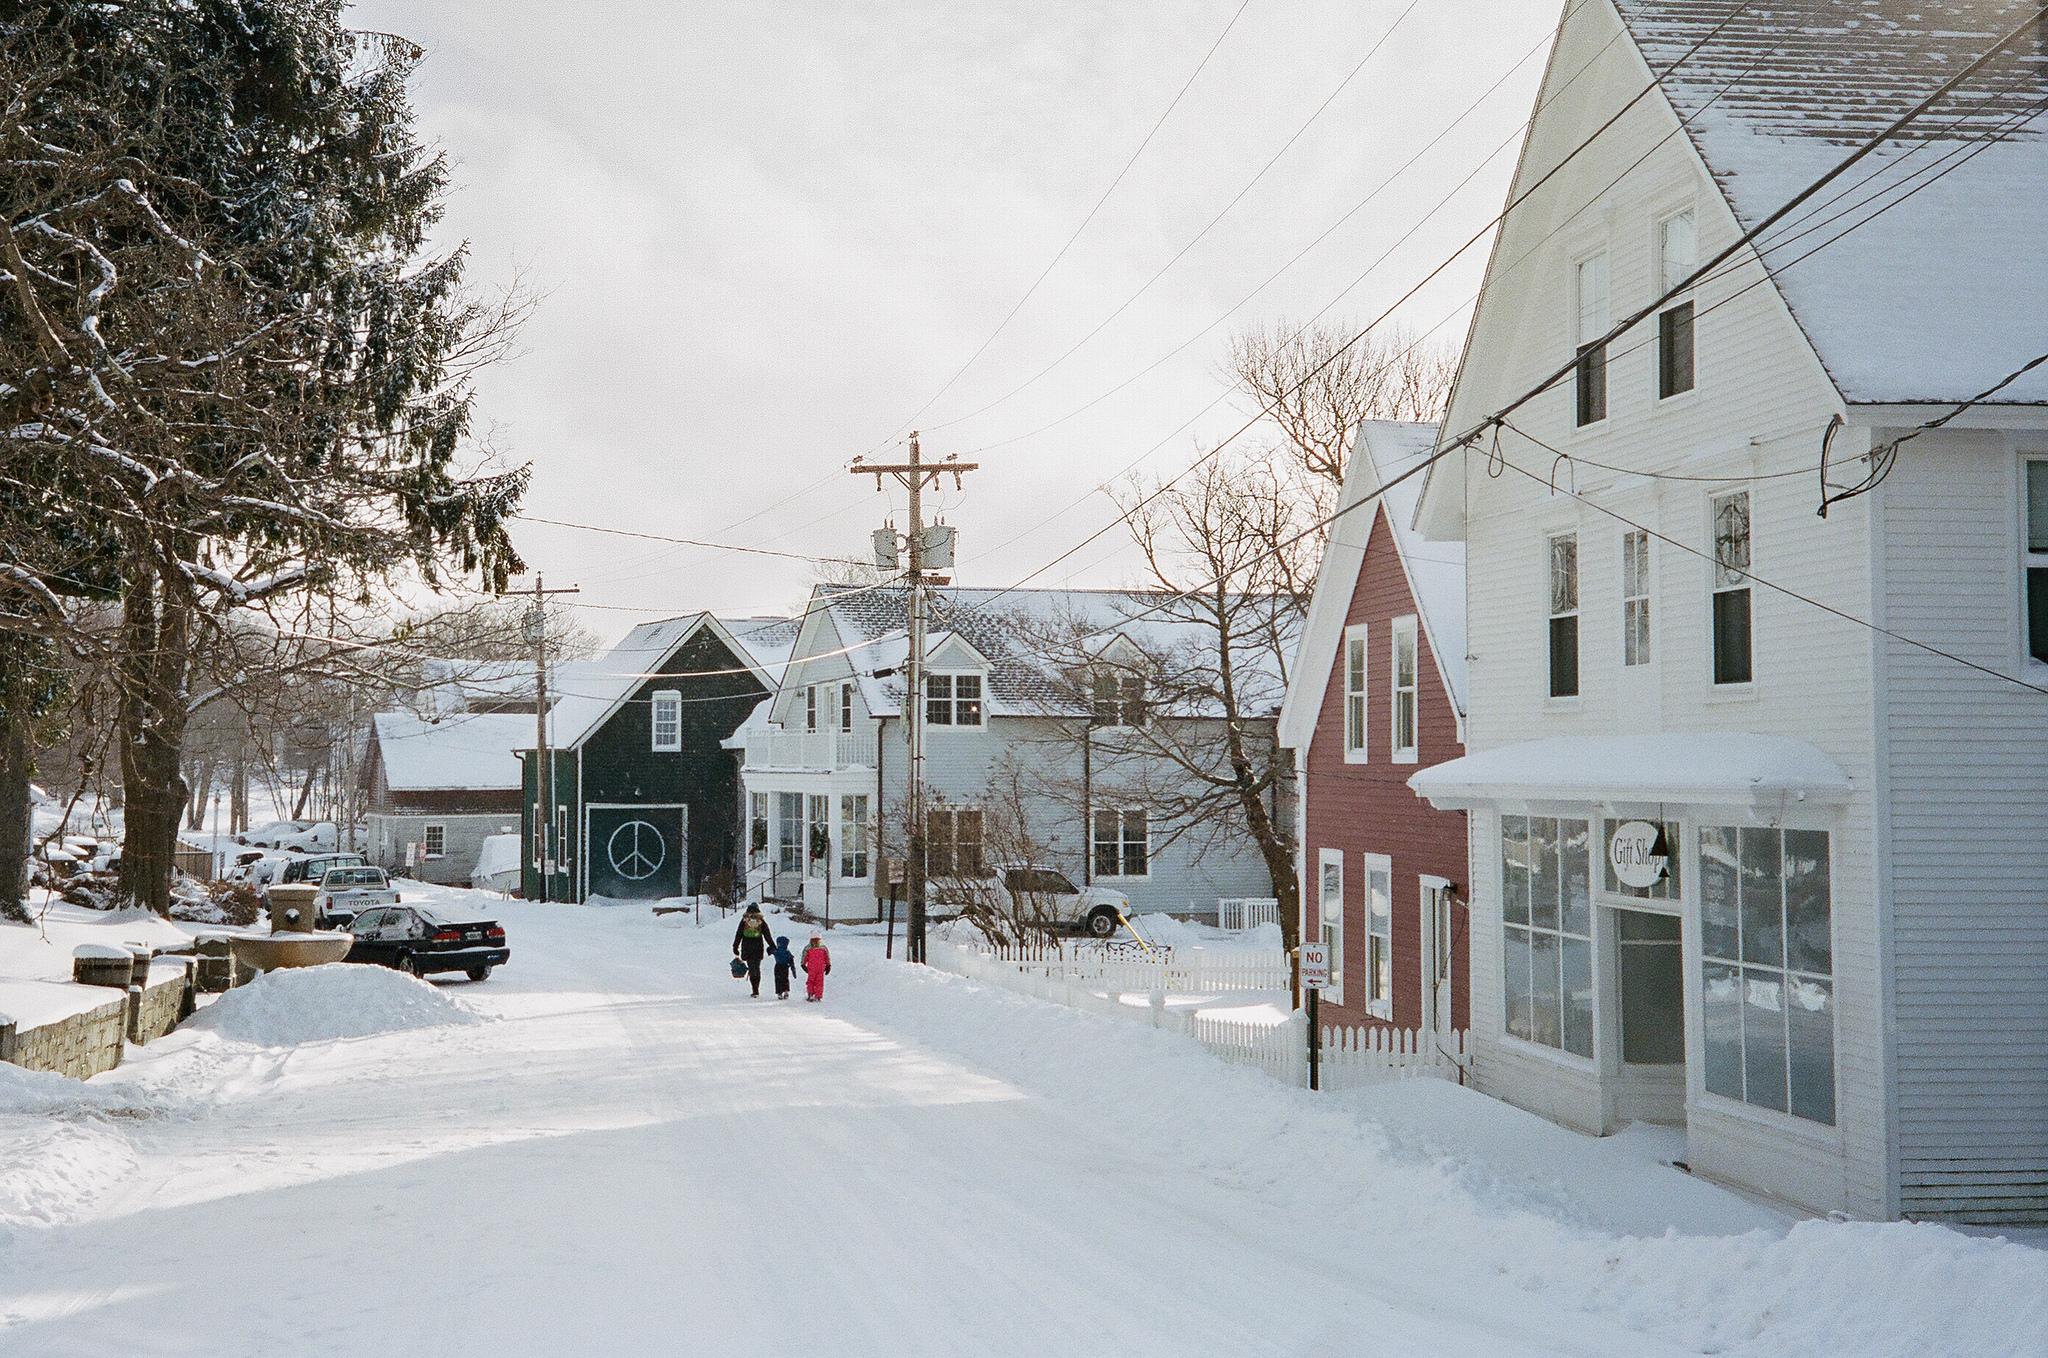 Village in Winter, 2016 – Photo by Bill Trevaskis